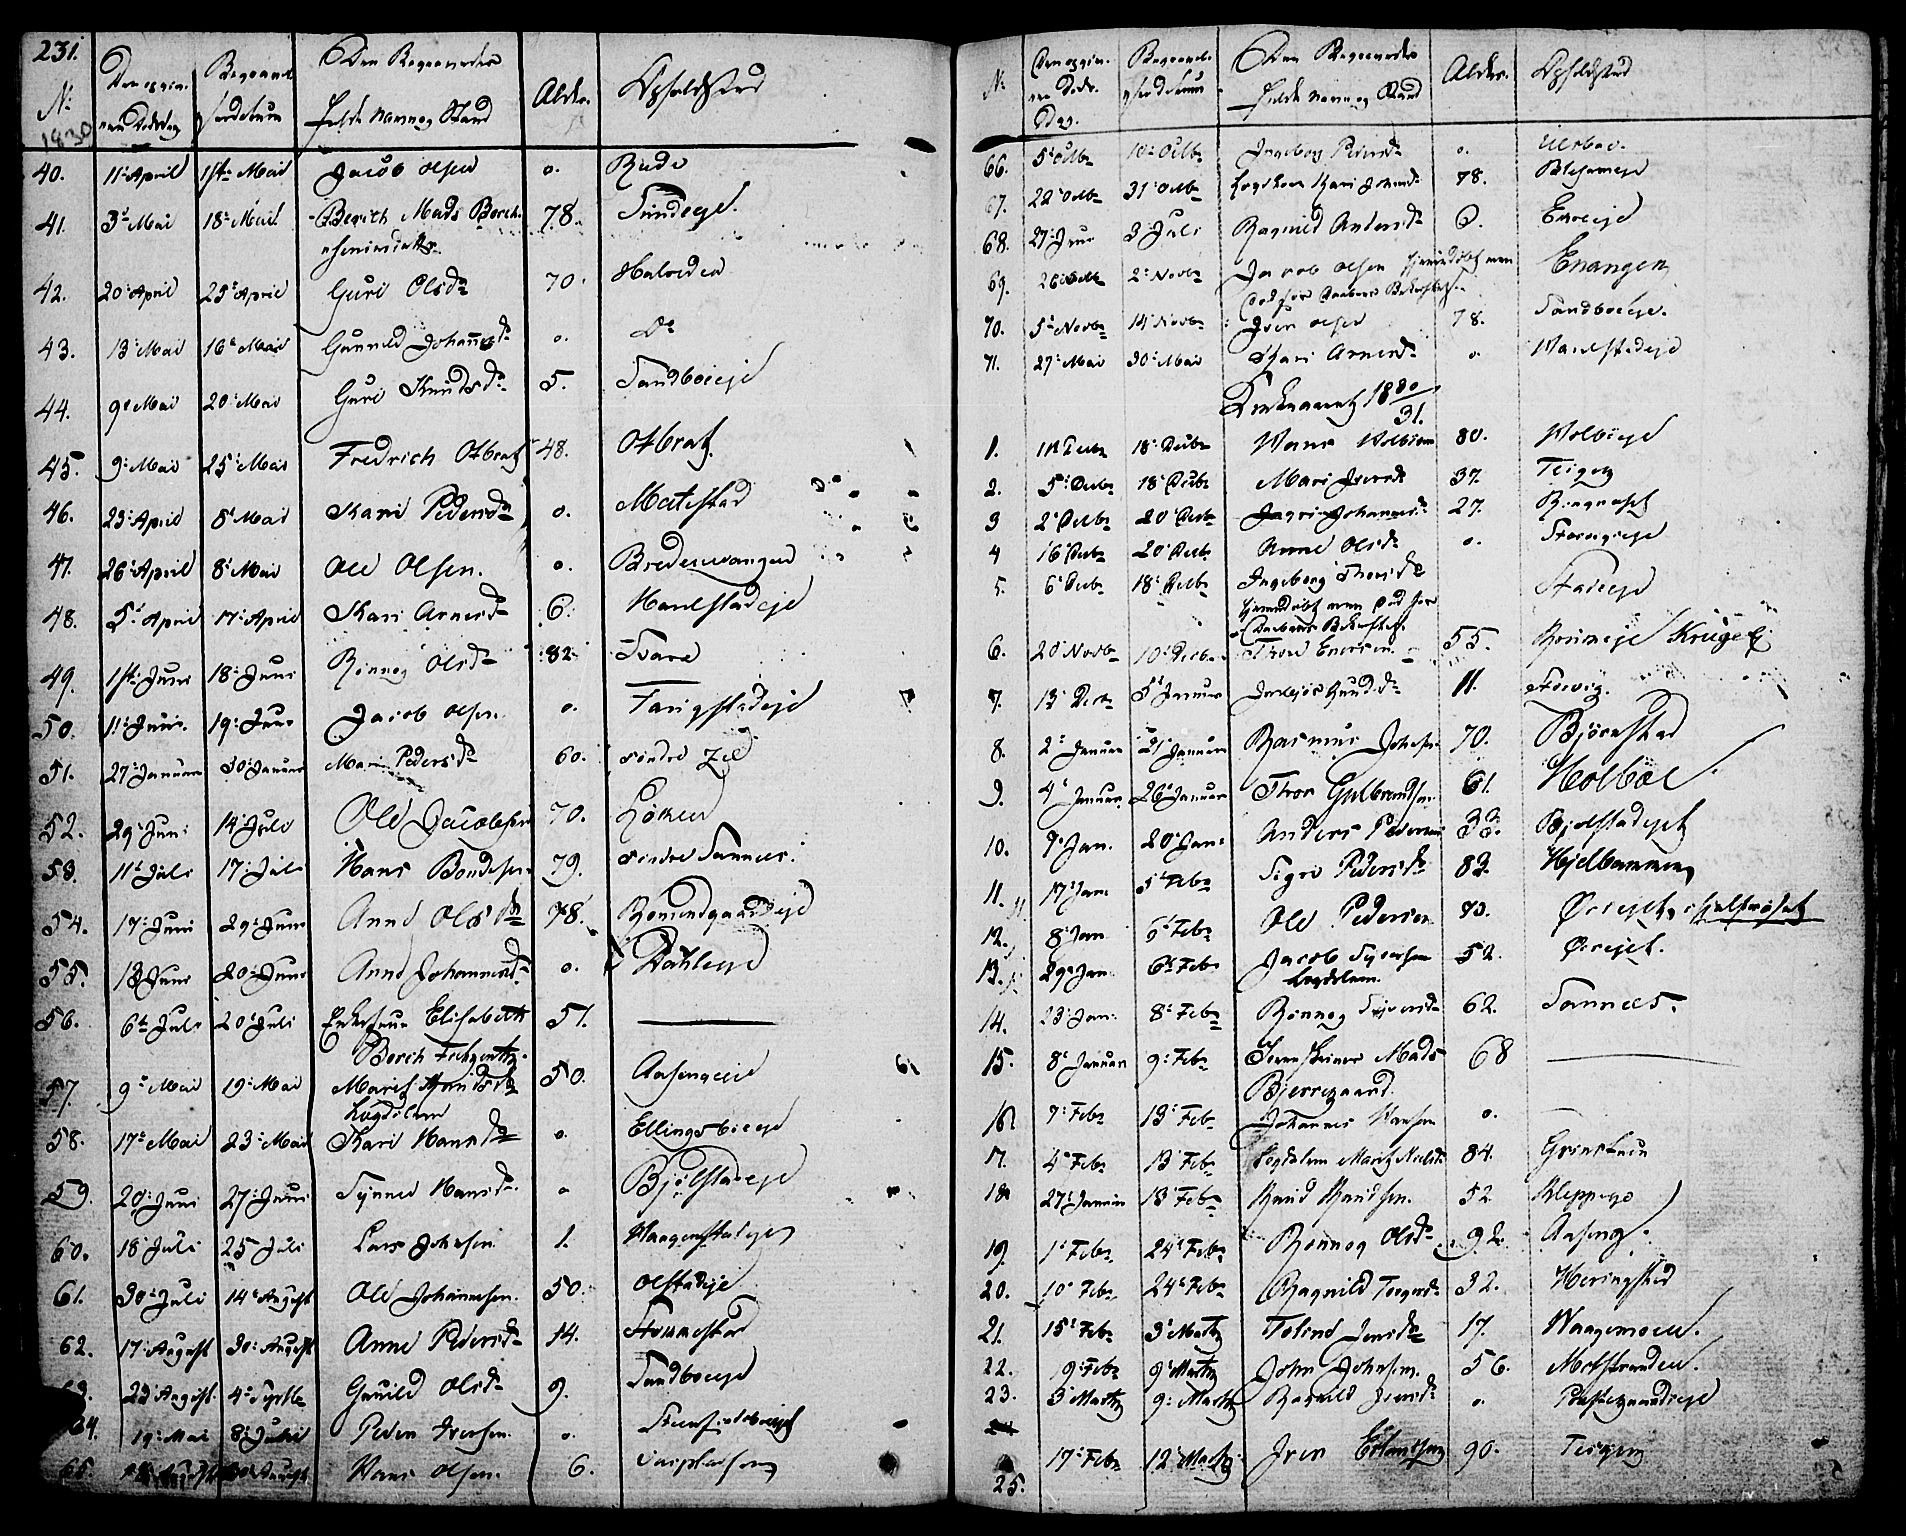 SAH, Vågå prestekontor, Ministerialbok nr. 4 /1, 1827-1842, s. 231